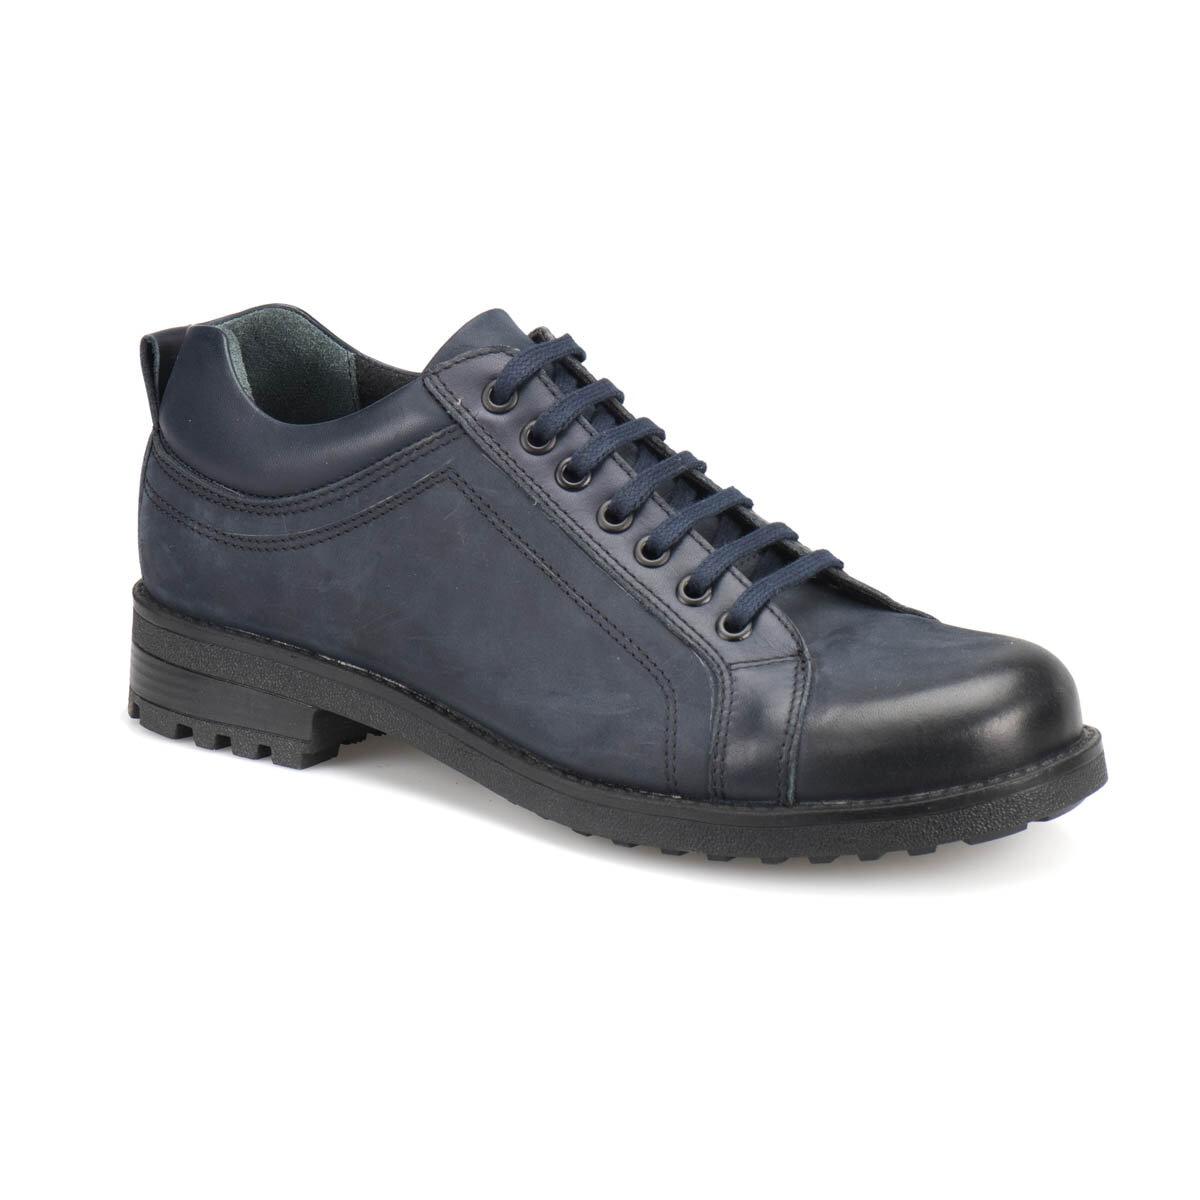 FLO 4010 Navy Blue Men 'S Shoes Forester